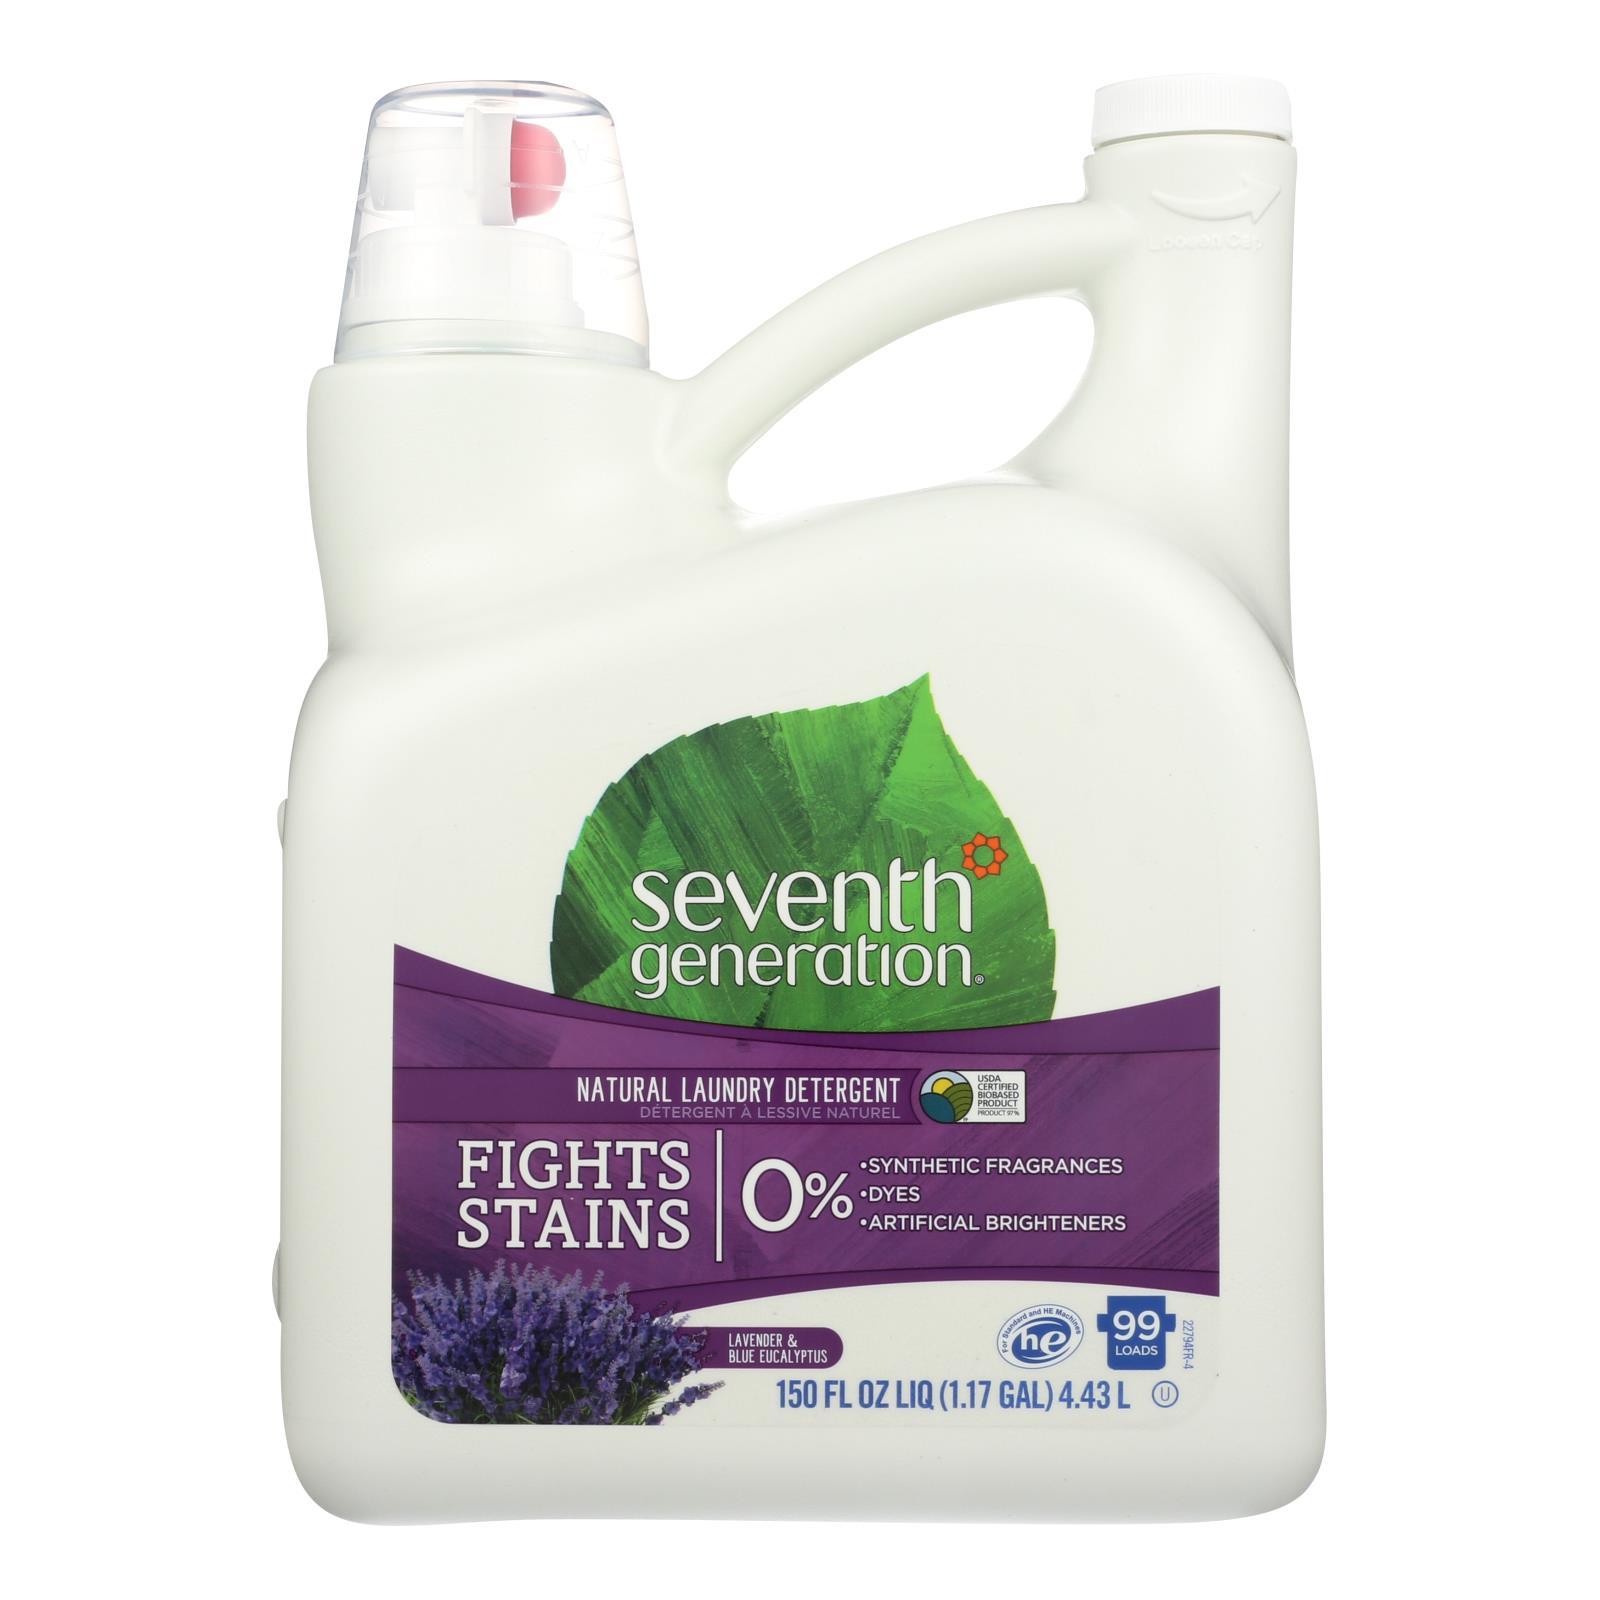 Seventh Generation Natural Laundry Detergent - Blue Eucalyptus and Lavender - Case of 4 - 150 Fl oz.